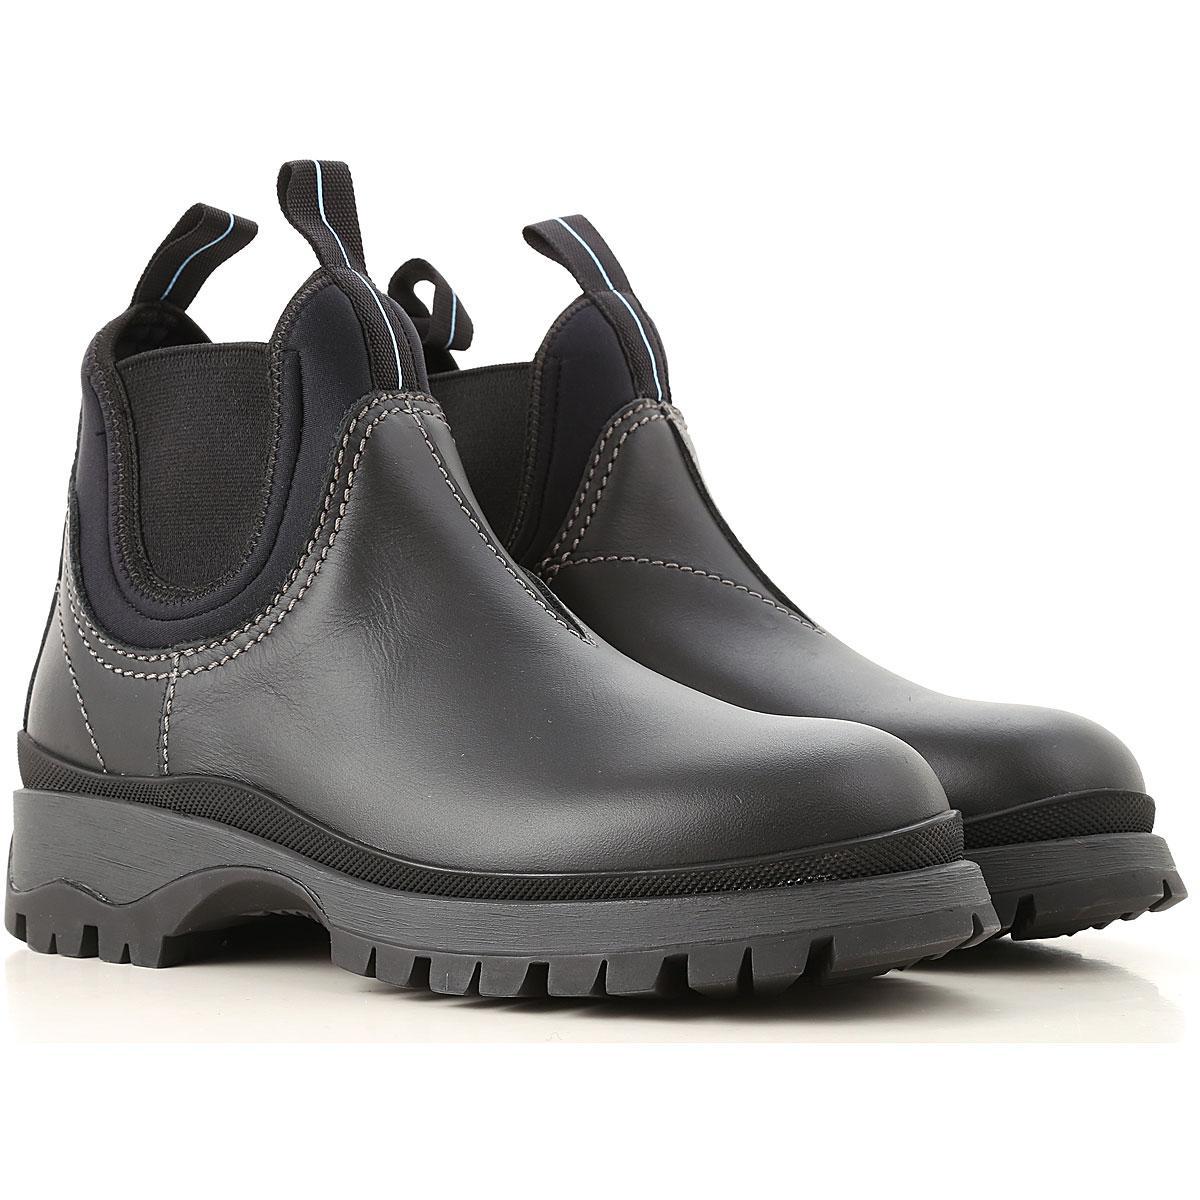 Lyst - Prada Shoes For Women in Black - Save 25% ae308b907